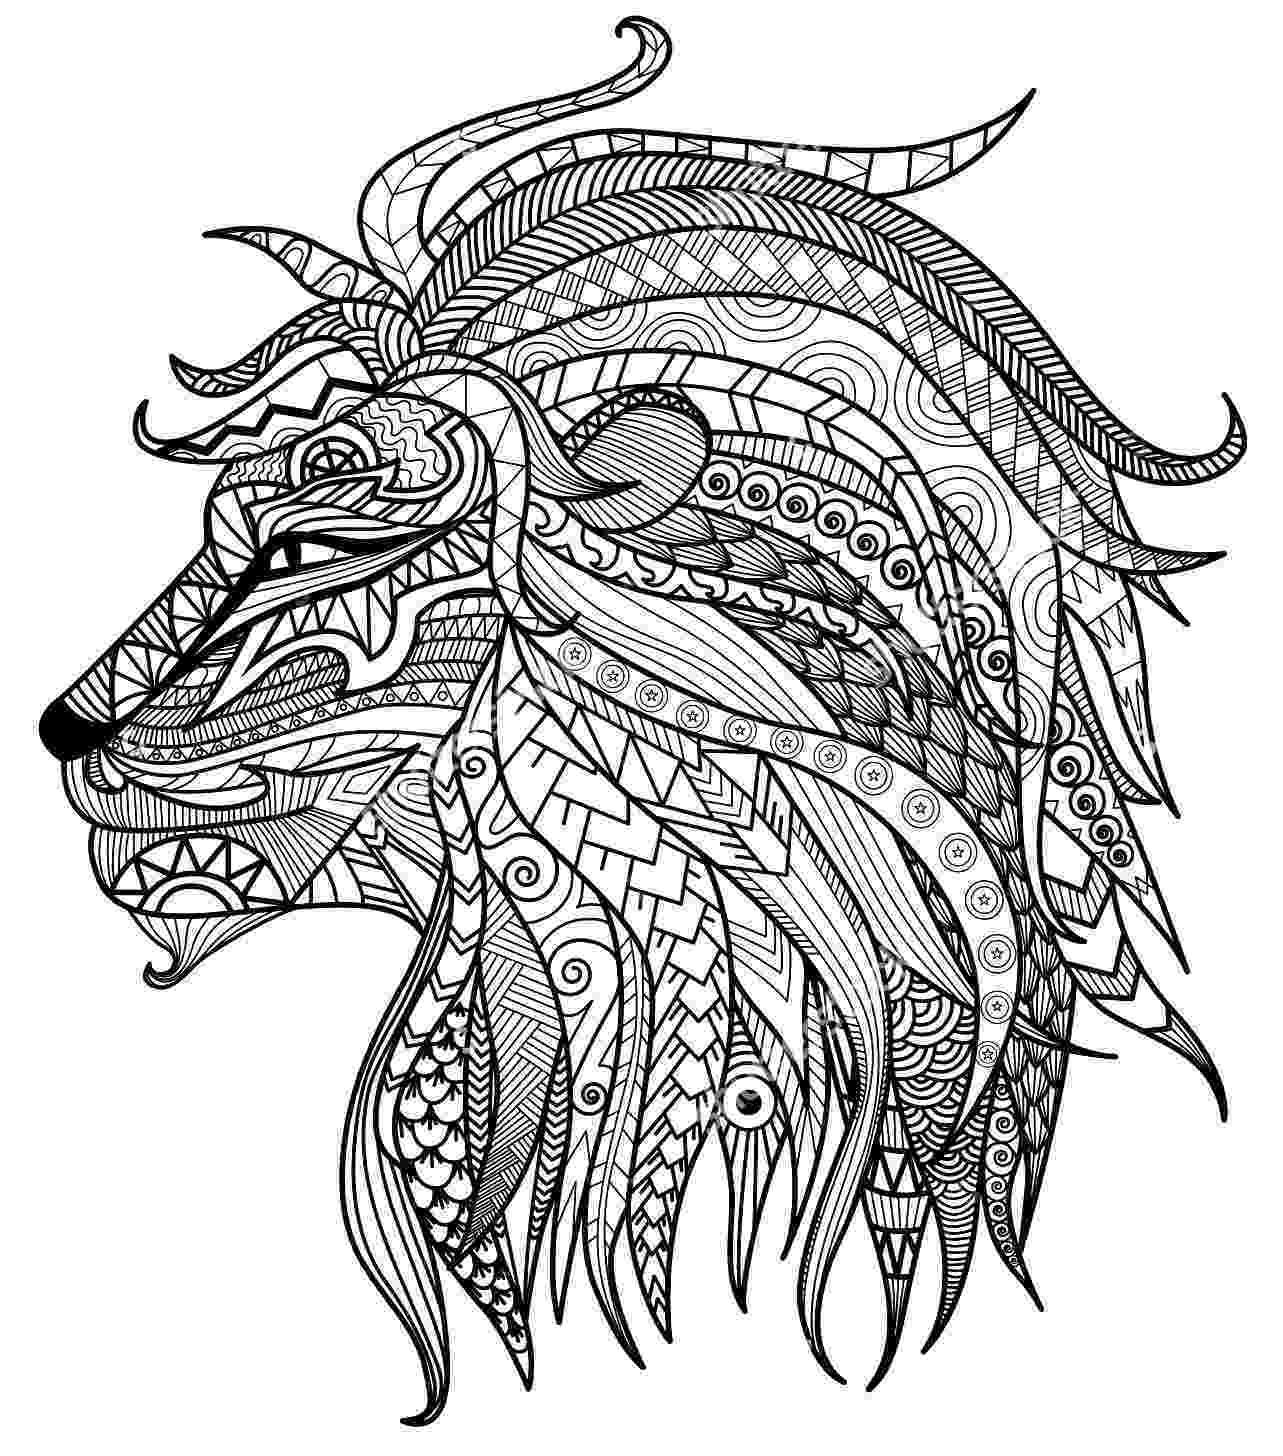 lion head coloring page lion head adult antistress coloring page stock vector head page lion coloring